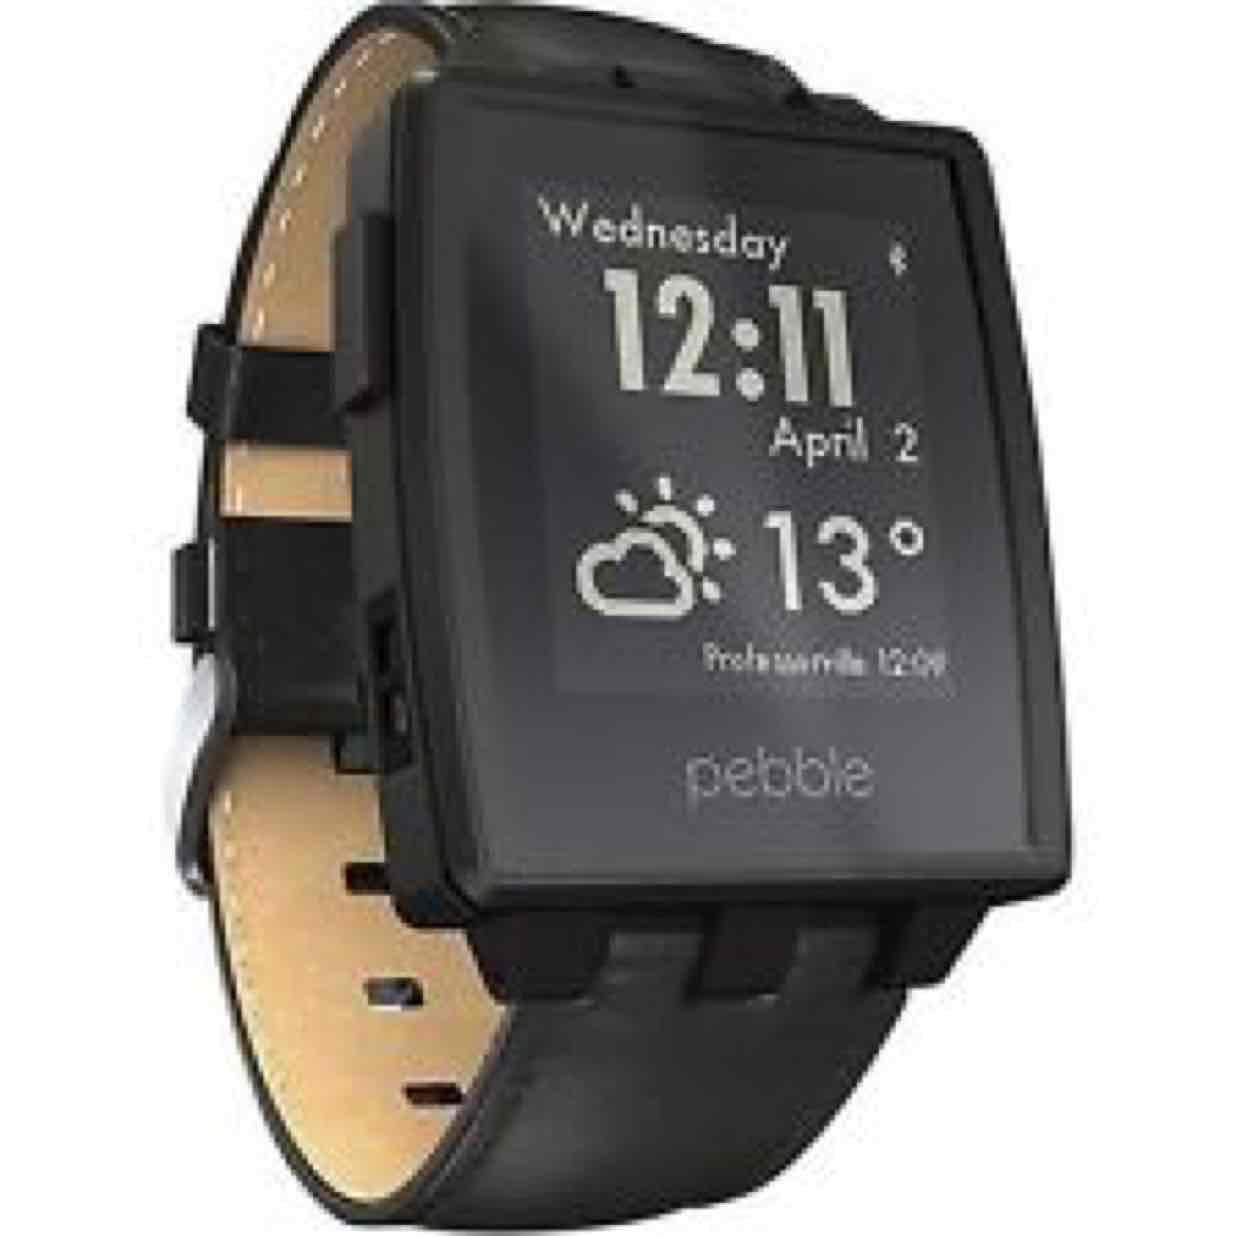 Inteligentny Zegarek Pebble Steel Smart Watch - Matte Czarny (Skórzany Pasek) @ Amazon.uk